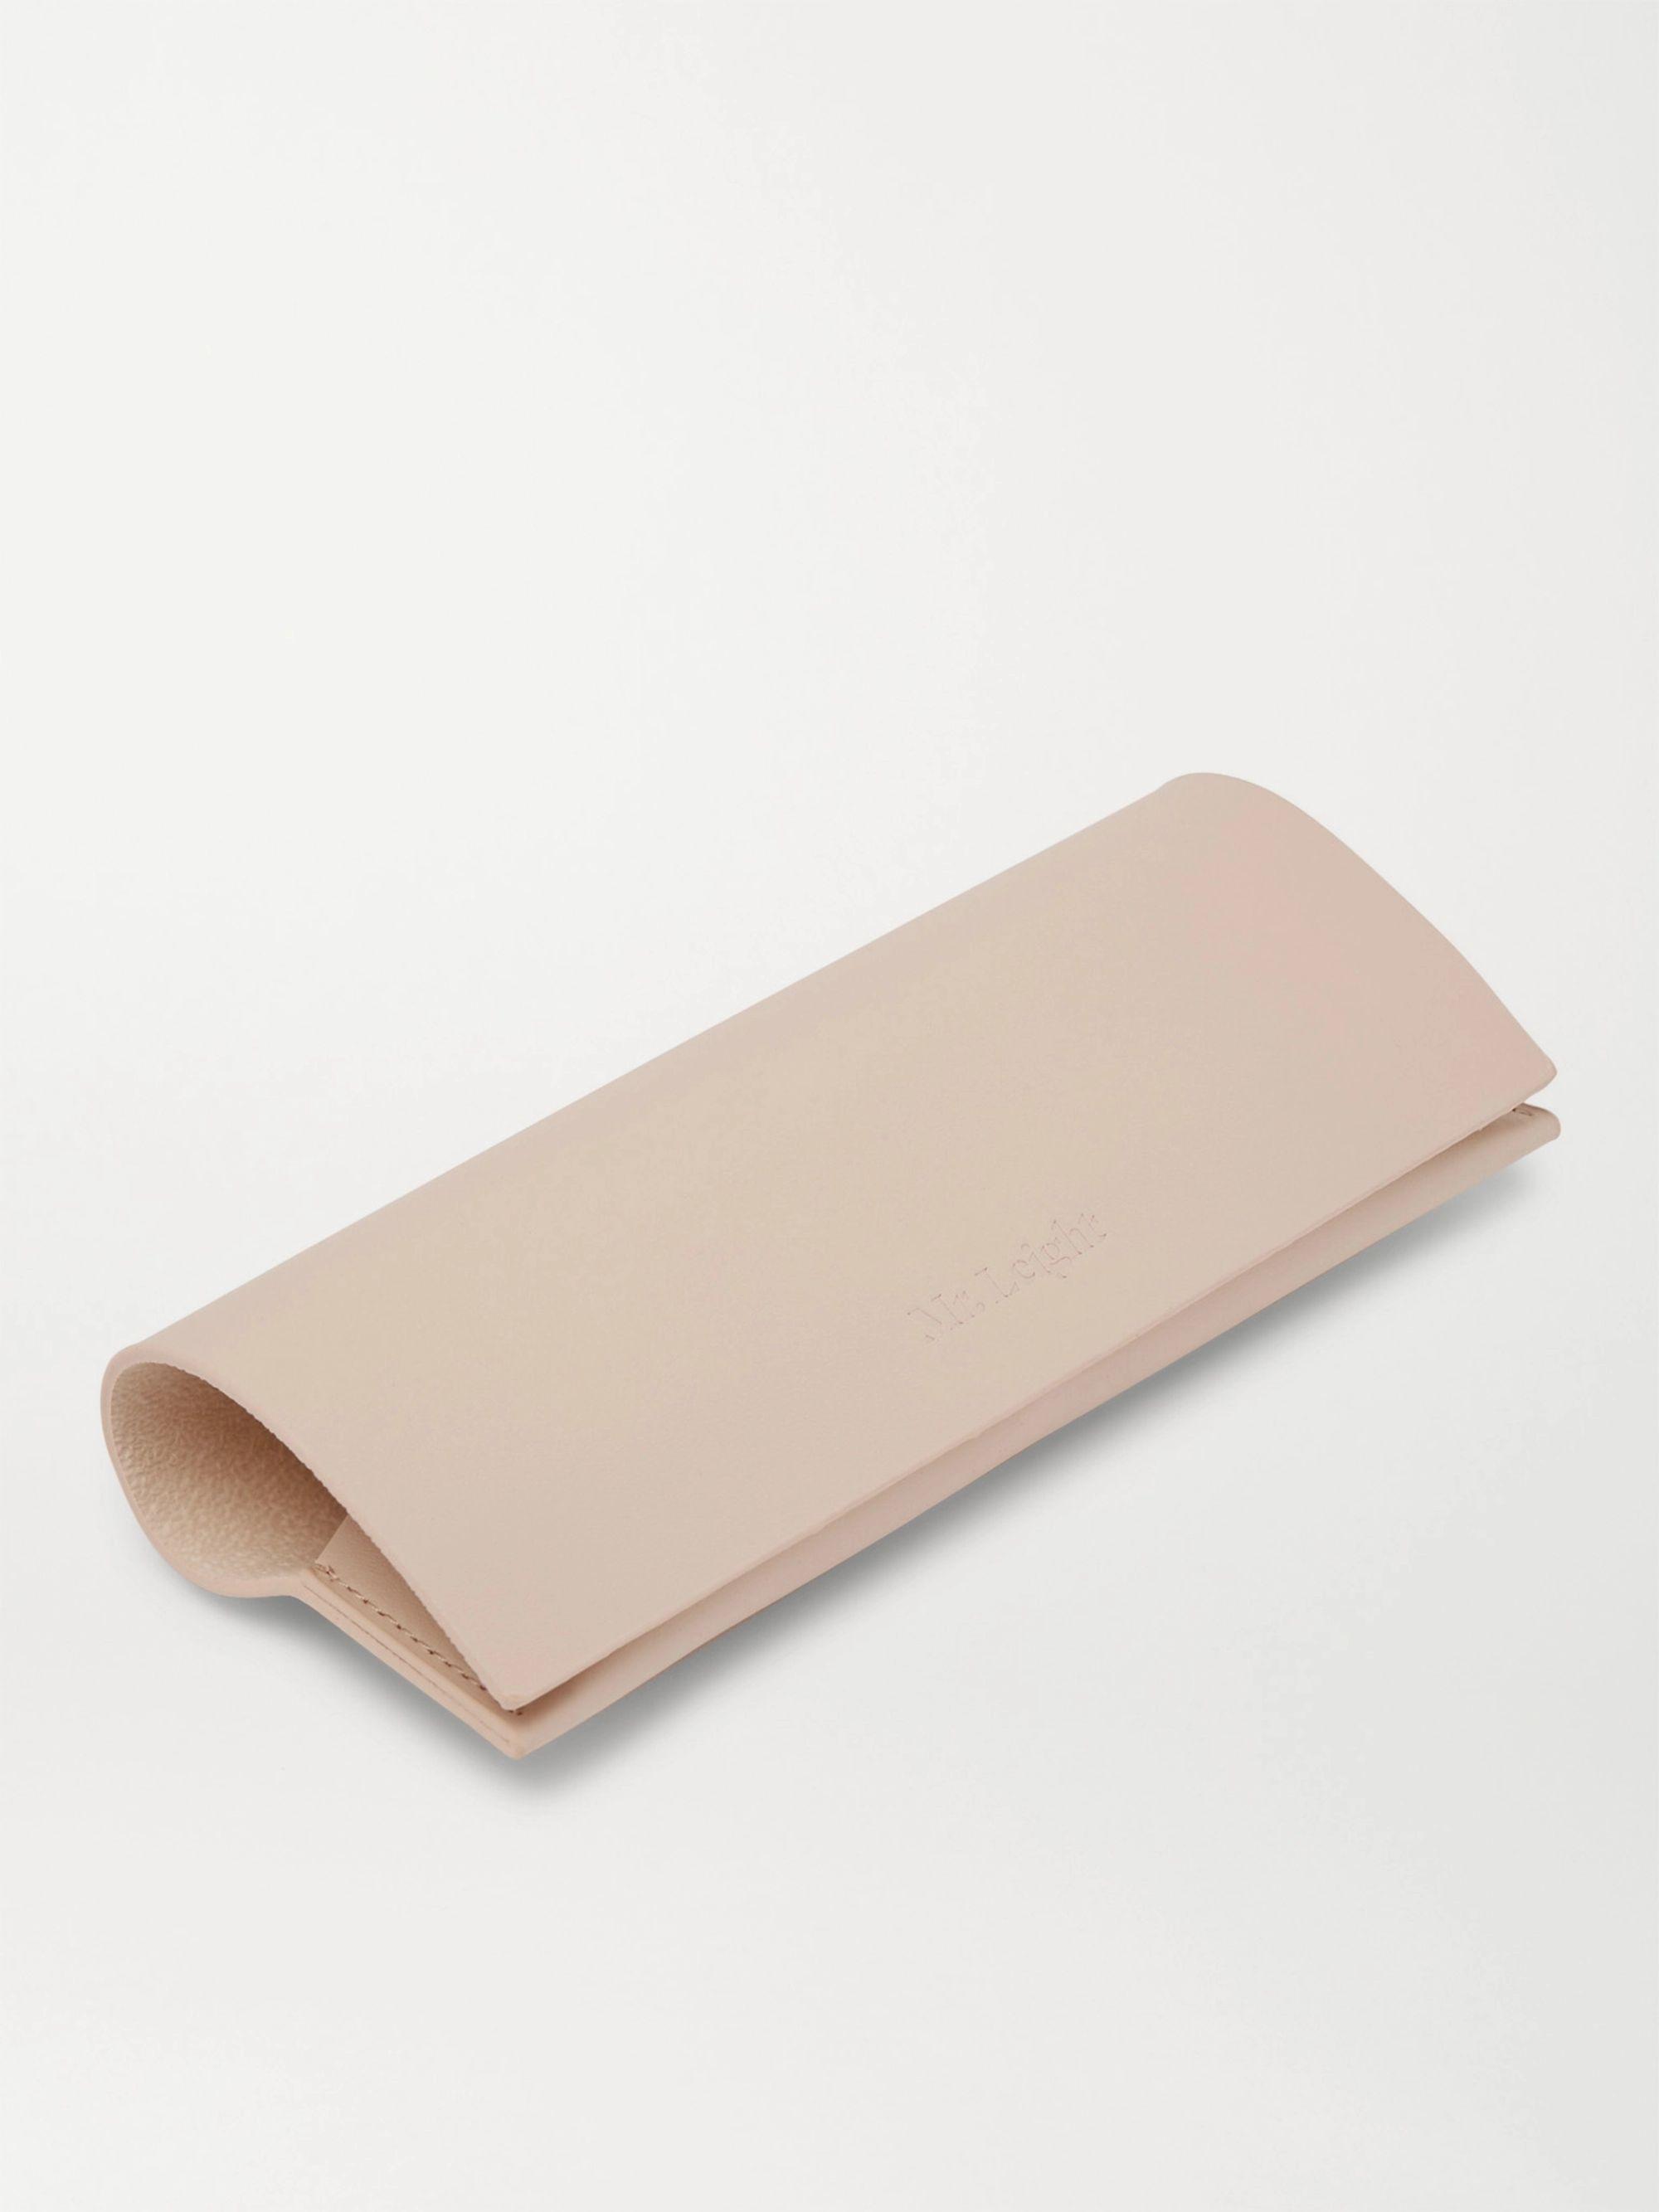 Black Getty S Square-frame Acetate And Titanium Sunglasses | Mr Leight